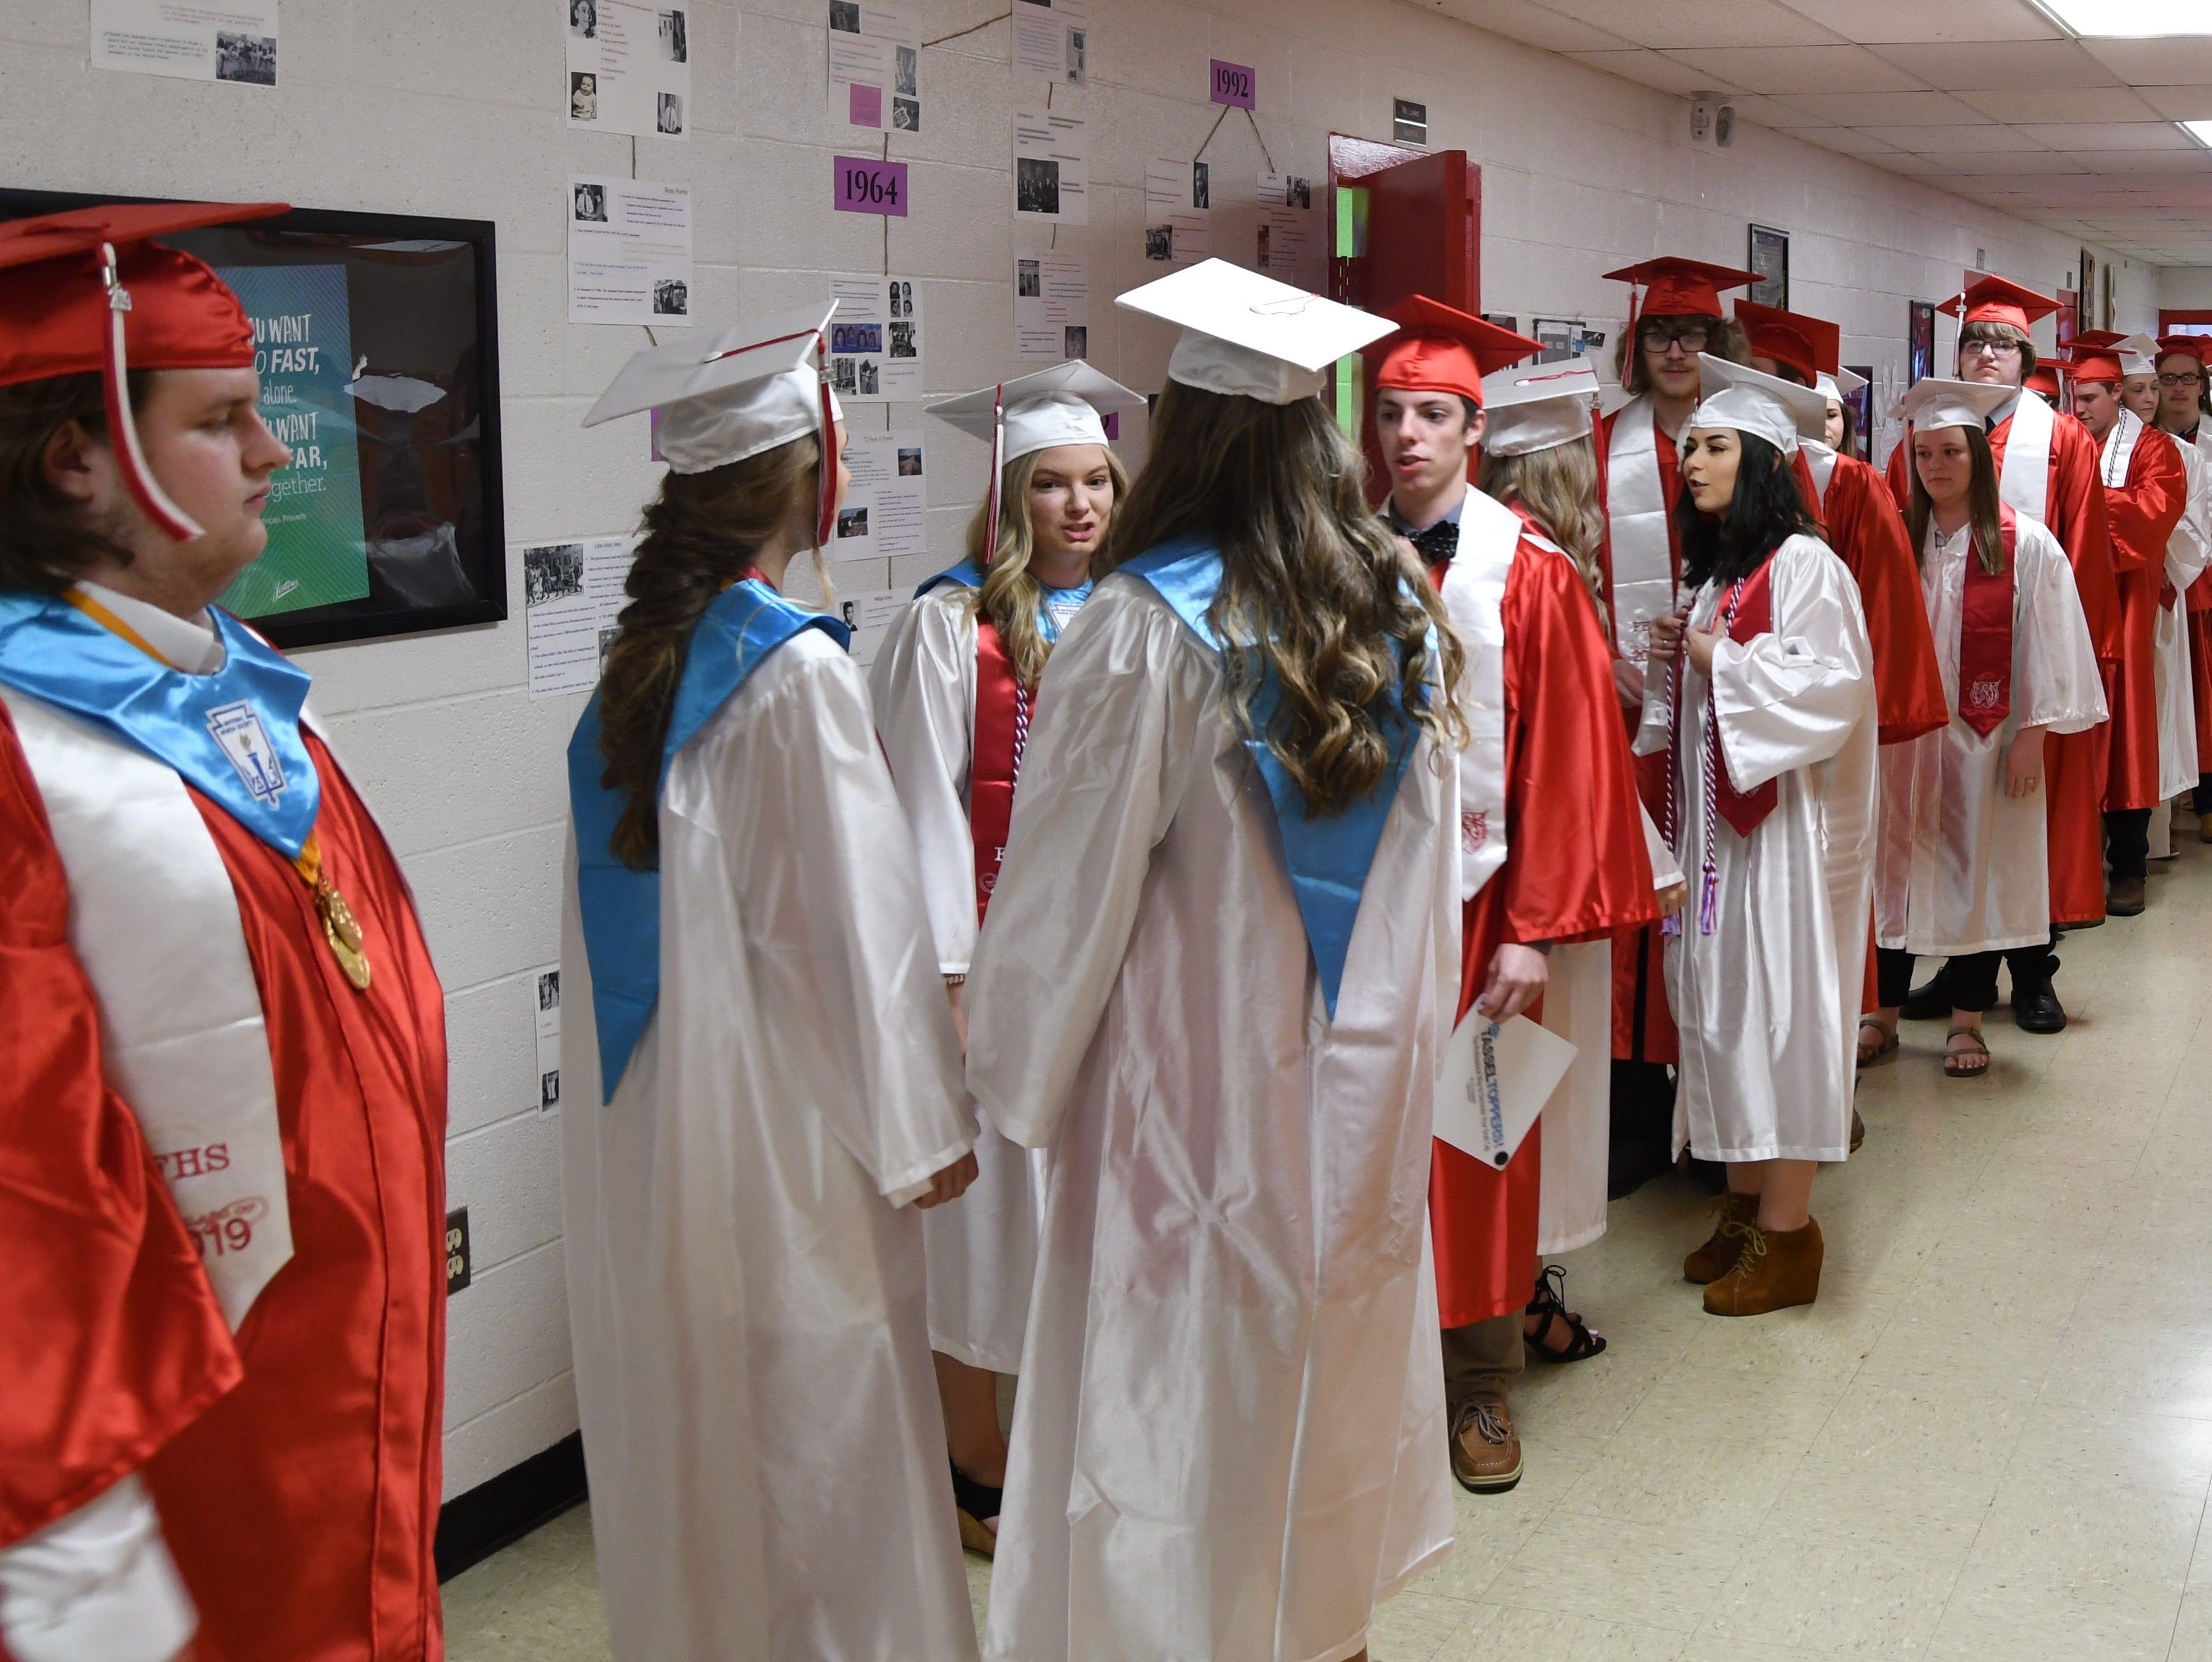 Flippin seniors line up in the hallway before graduation ceremonies start Friday night.